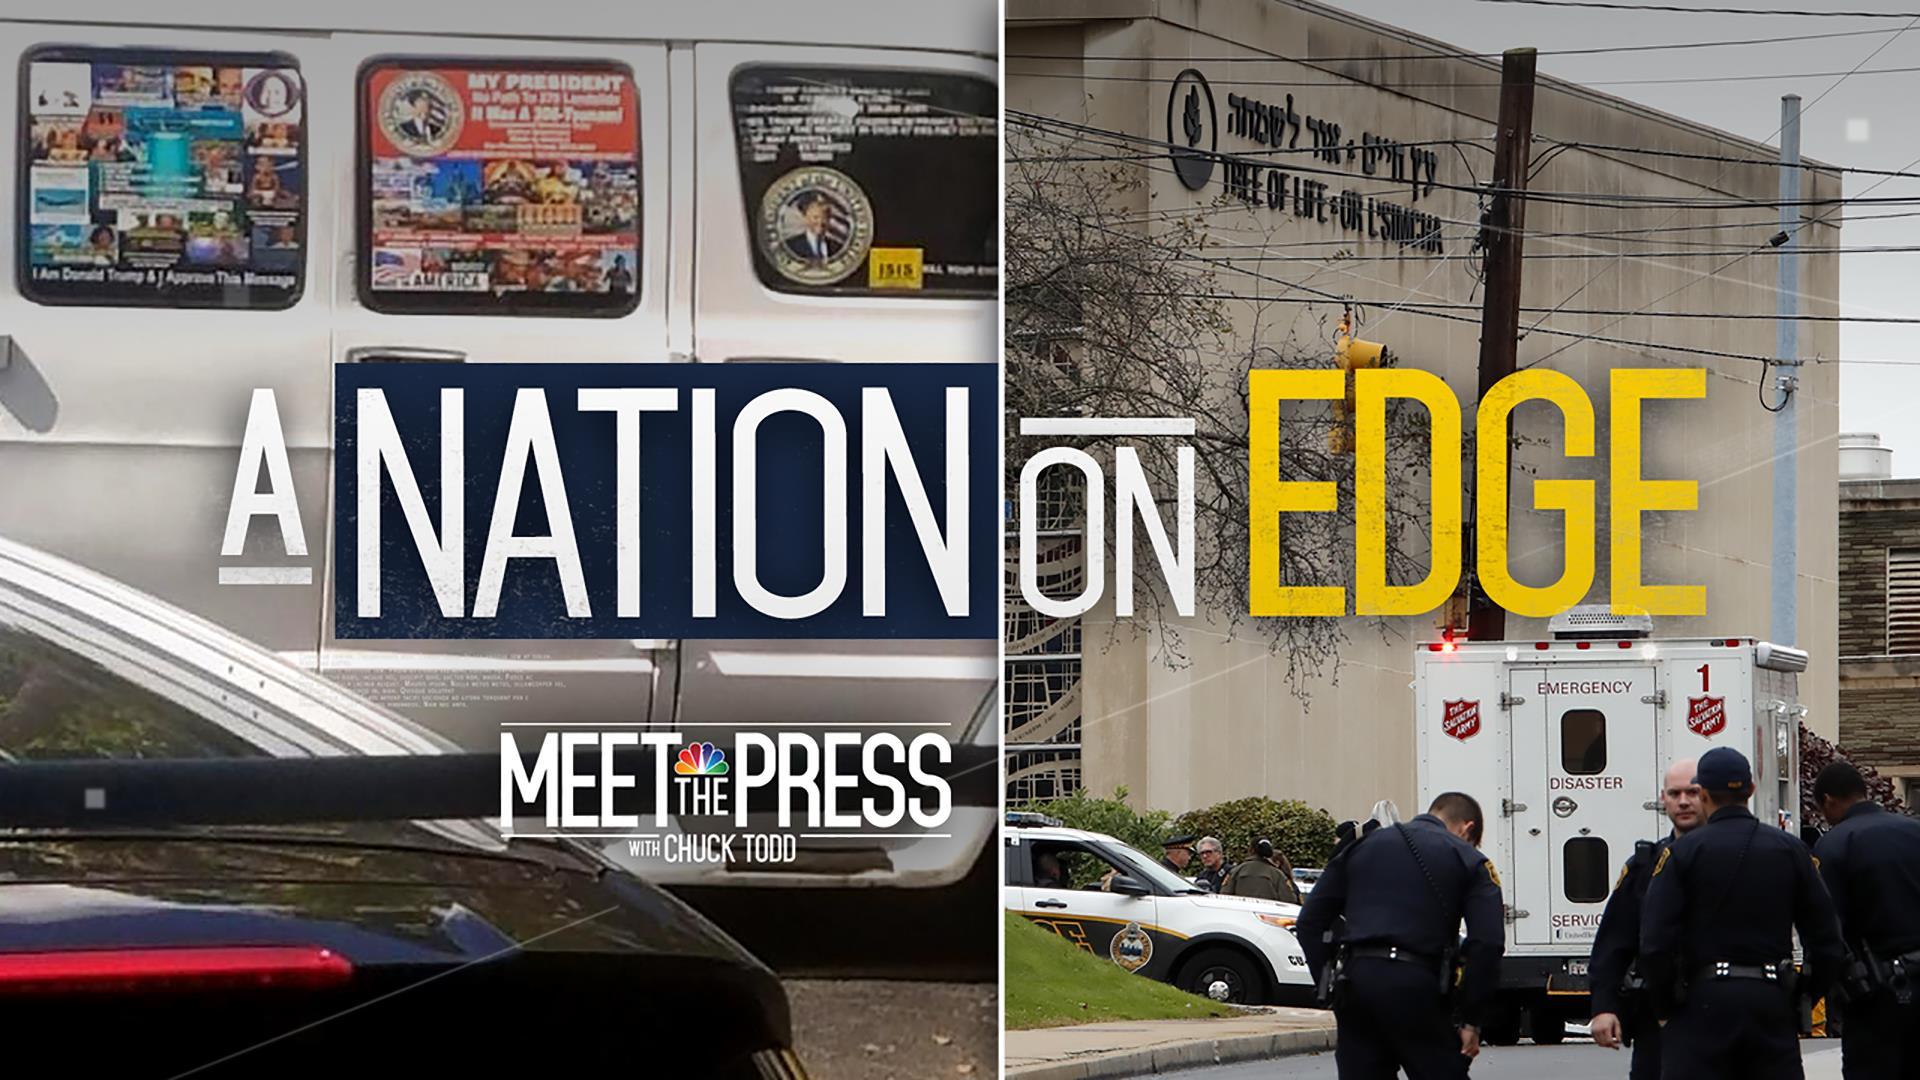 3e2ce1f08a2c https   www.nbcnews.com nightly-news-netcast video nightly-news-full ...